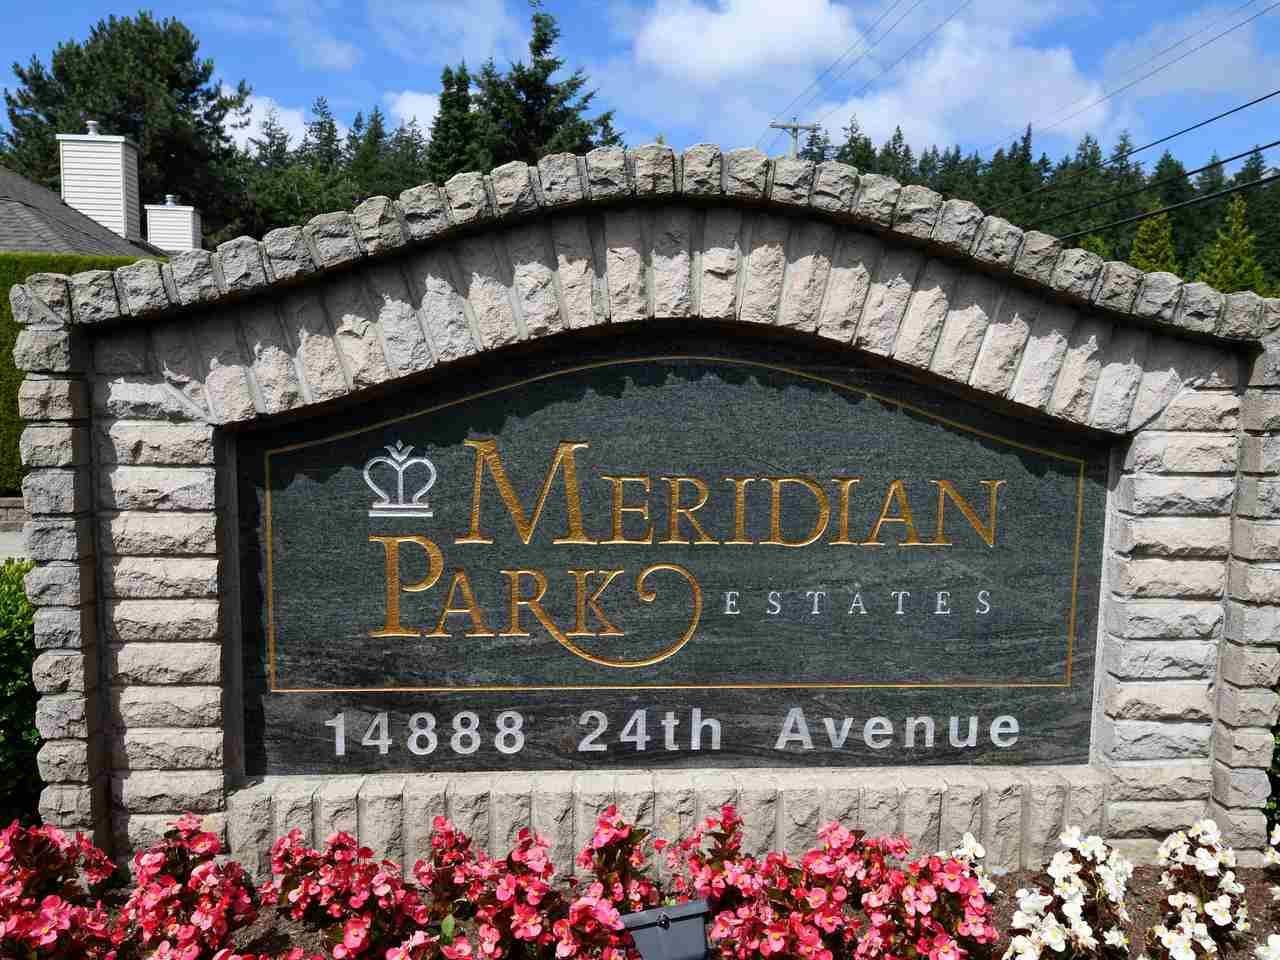 "Main Photo: 23 14888 24 Avenue in Surrey: Sunnyside Park Surrey Townhouse for sale in ""Meridian Park Estates"" (South Surrey White Rock)  : MLS®# R2381989"